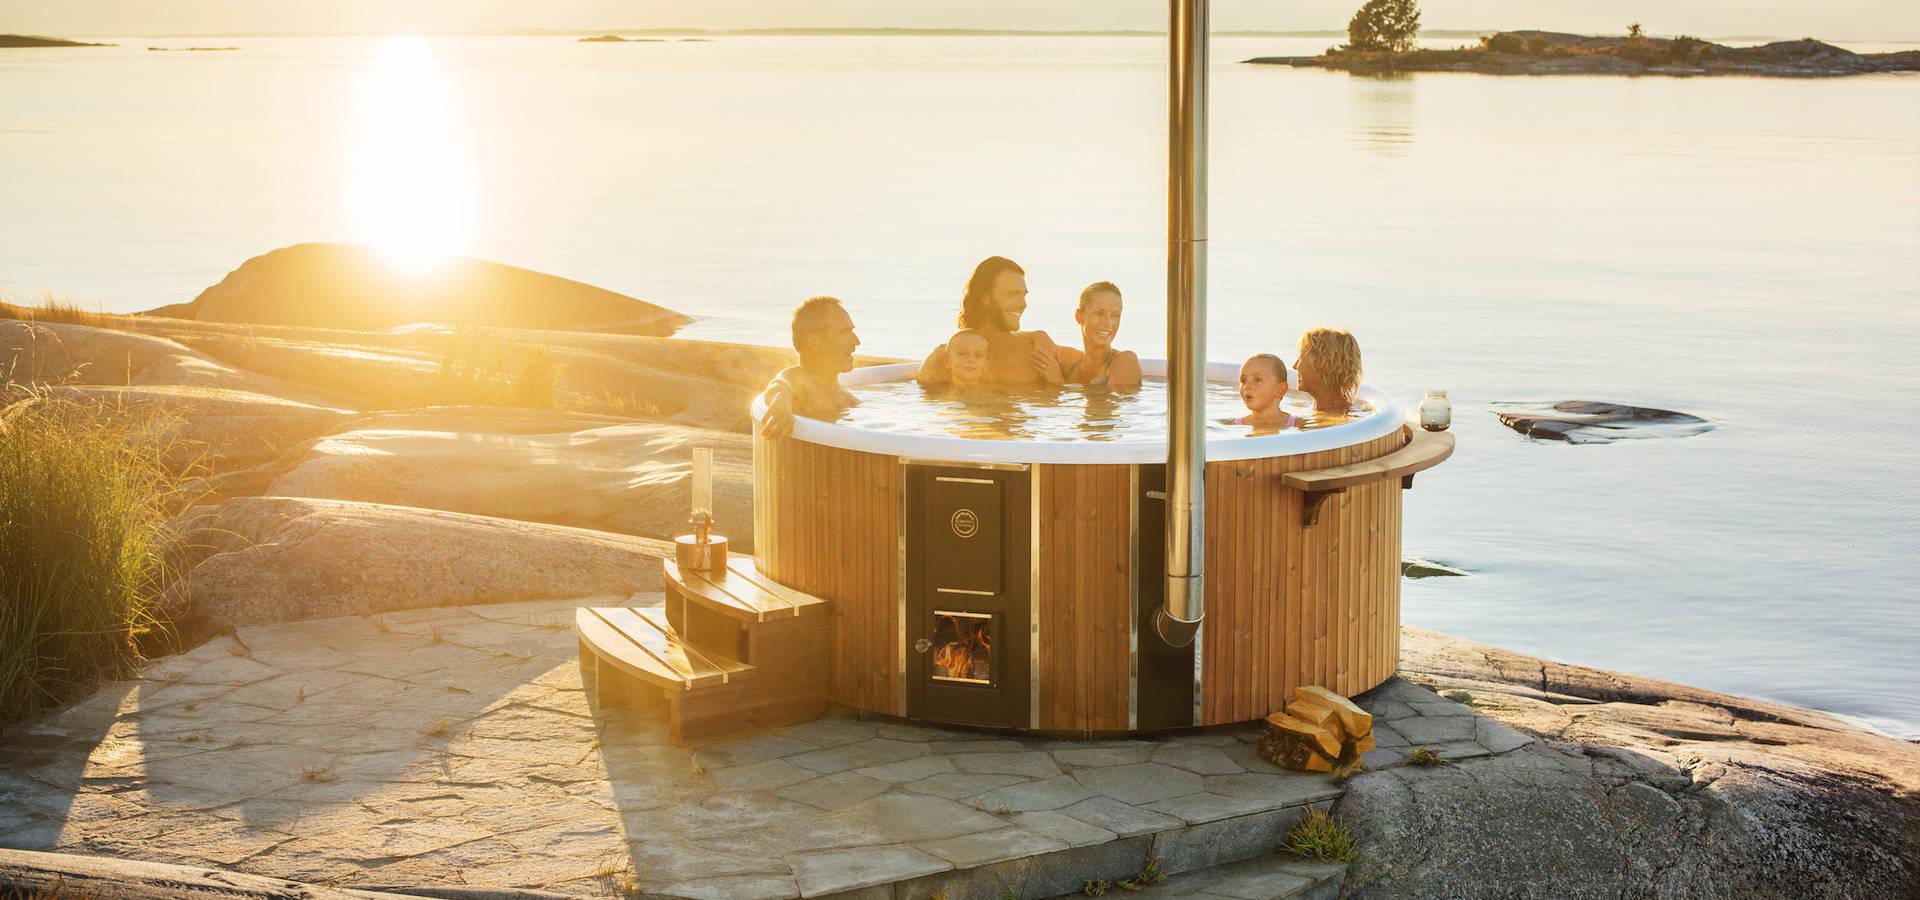 Skargards Hot Tubs NL